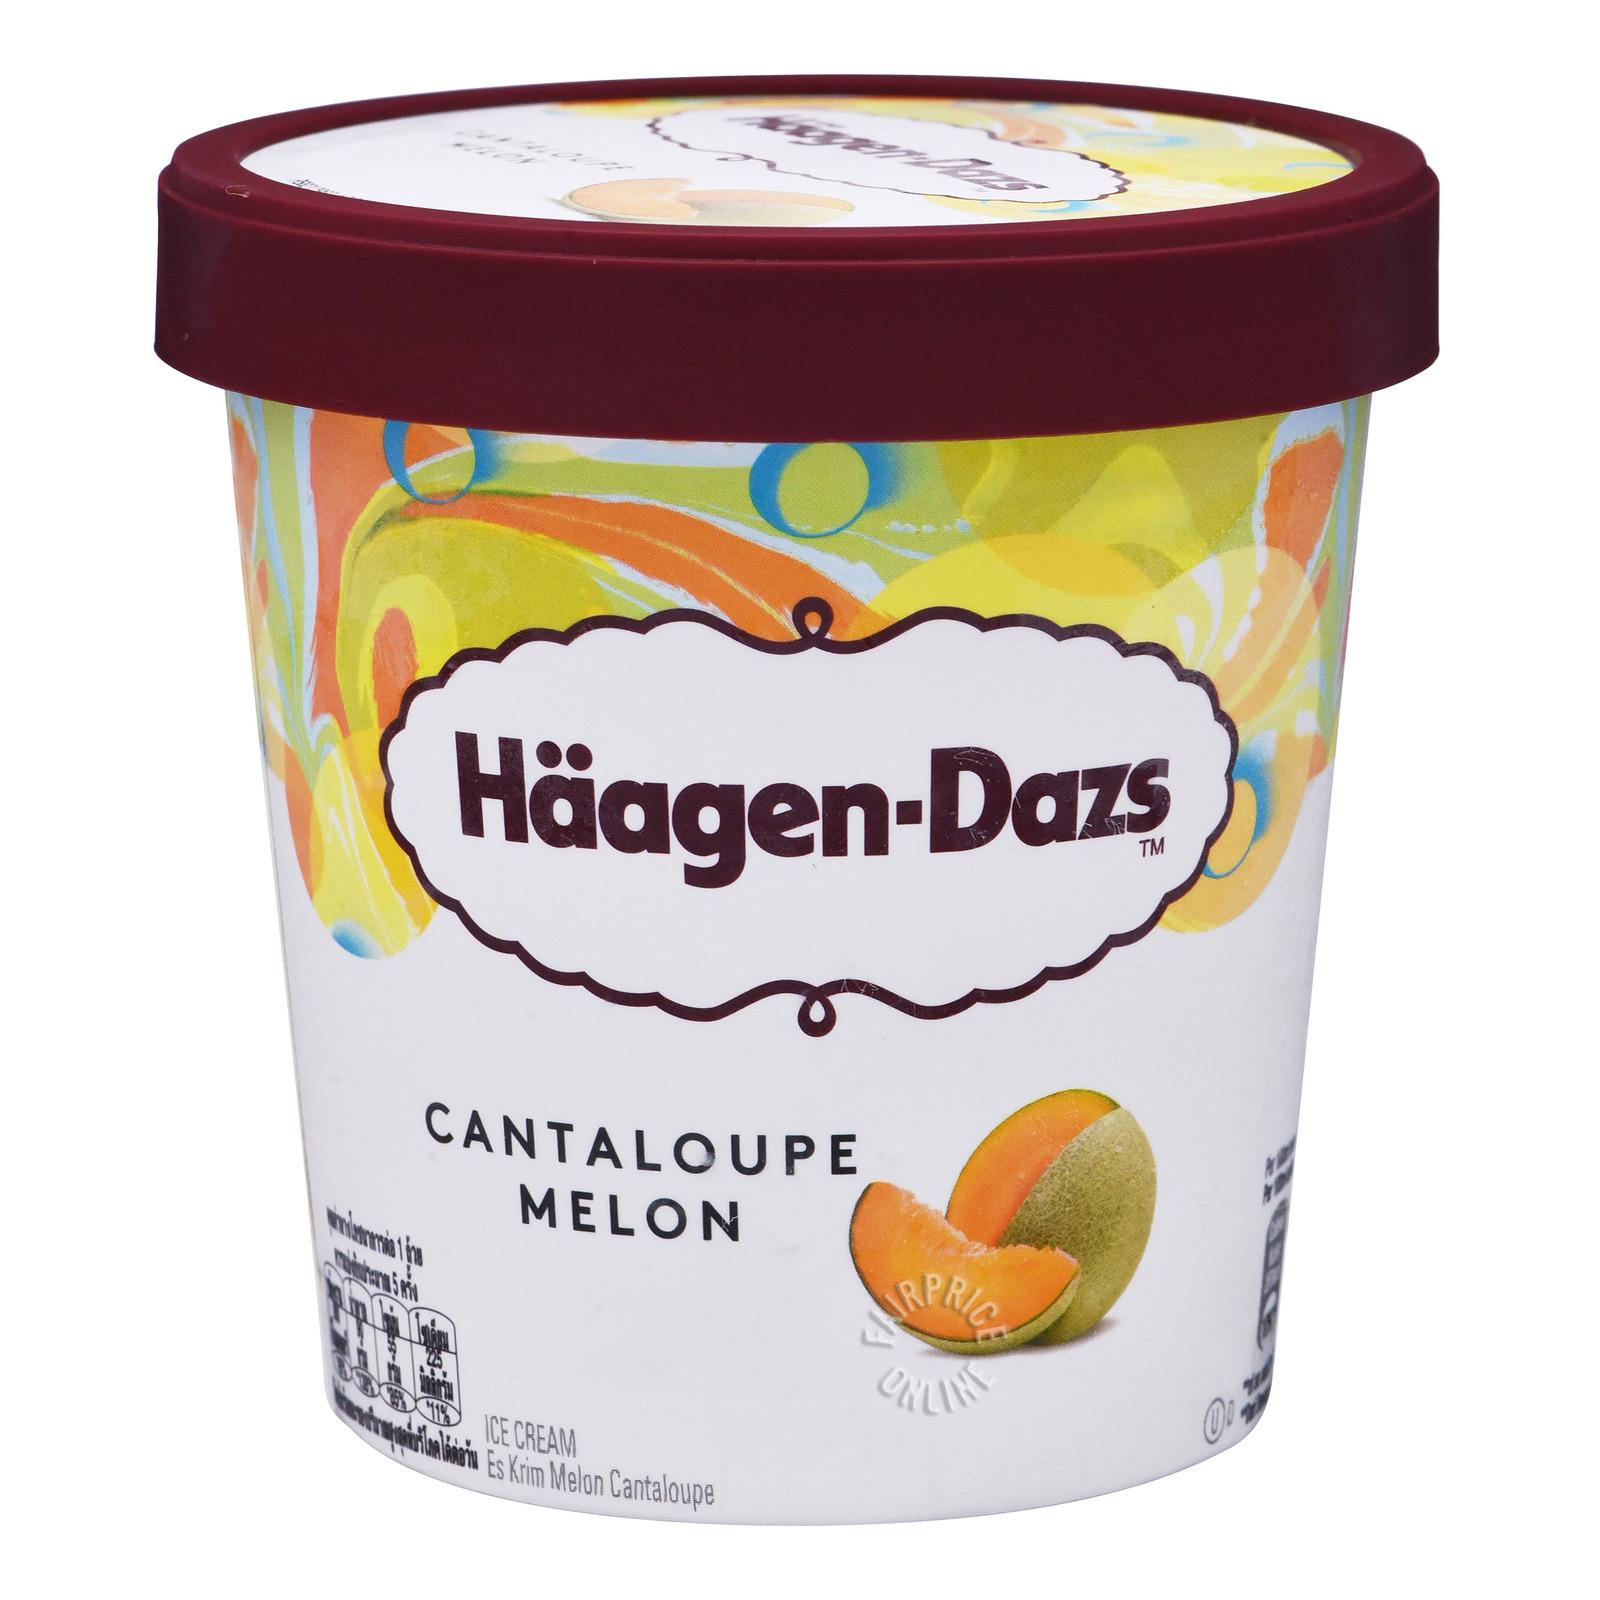 Haagen-Dazs Ice Cream - Cantaloupe Melon